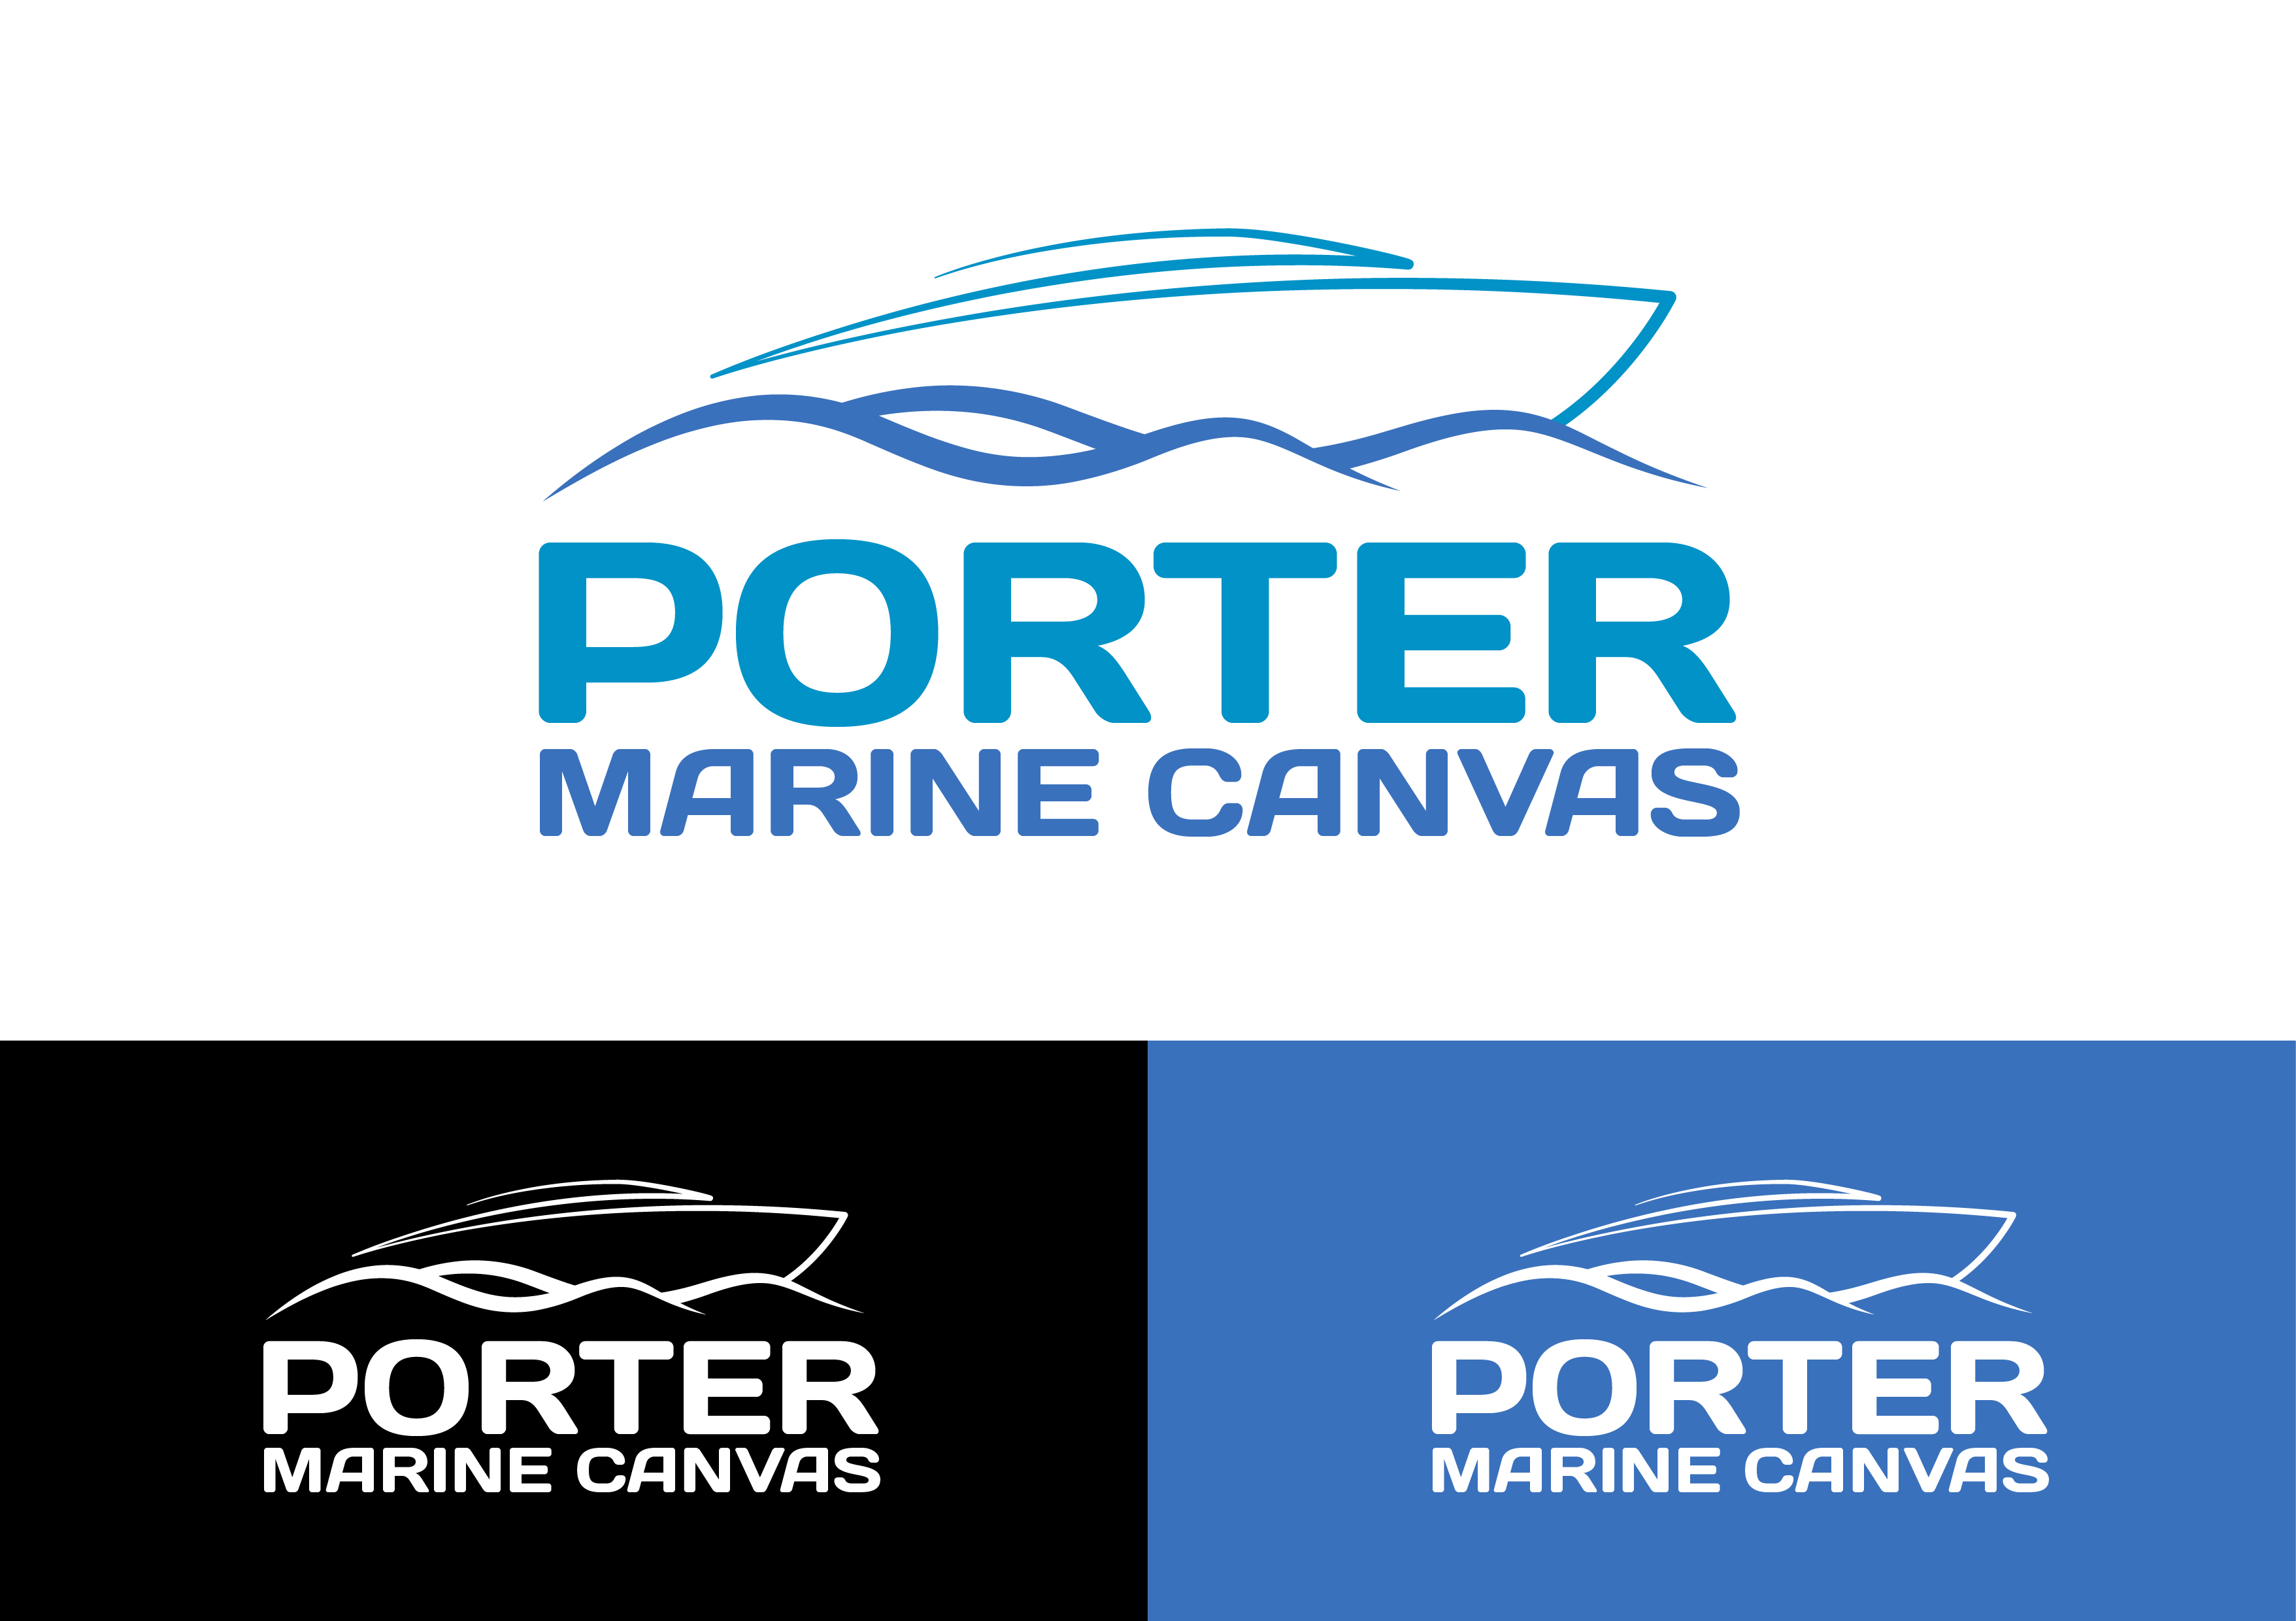 Logo Design by 3draw - Entry No. 207 in the Logo Design Contest Imaginative Logo Design for Porter Marine Canvas.